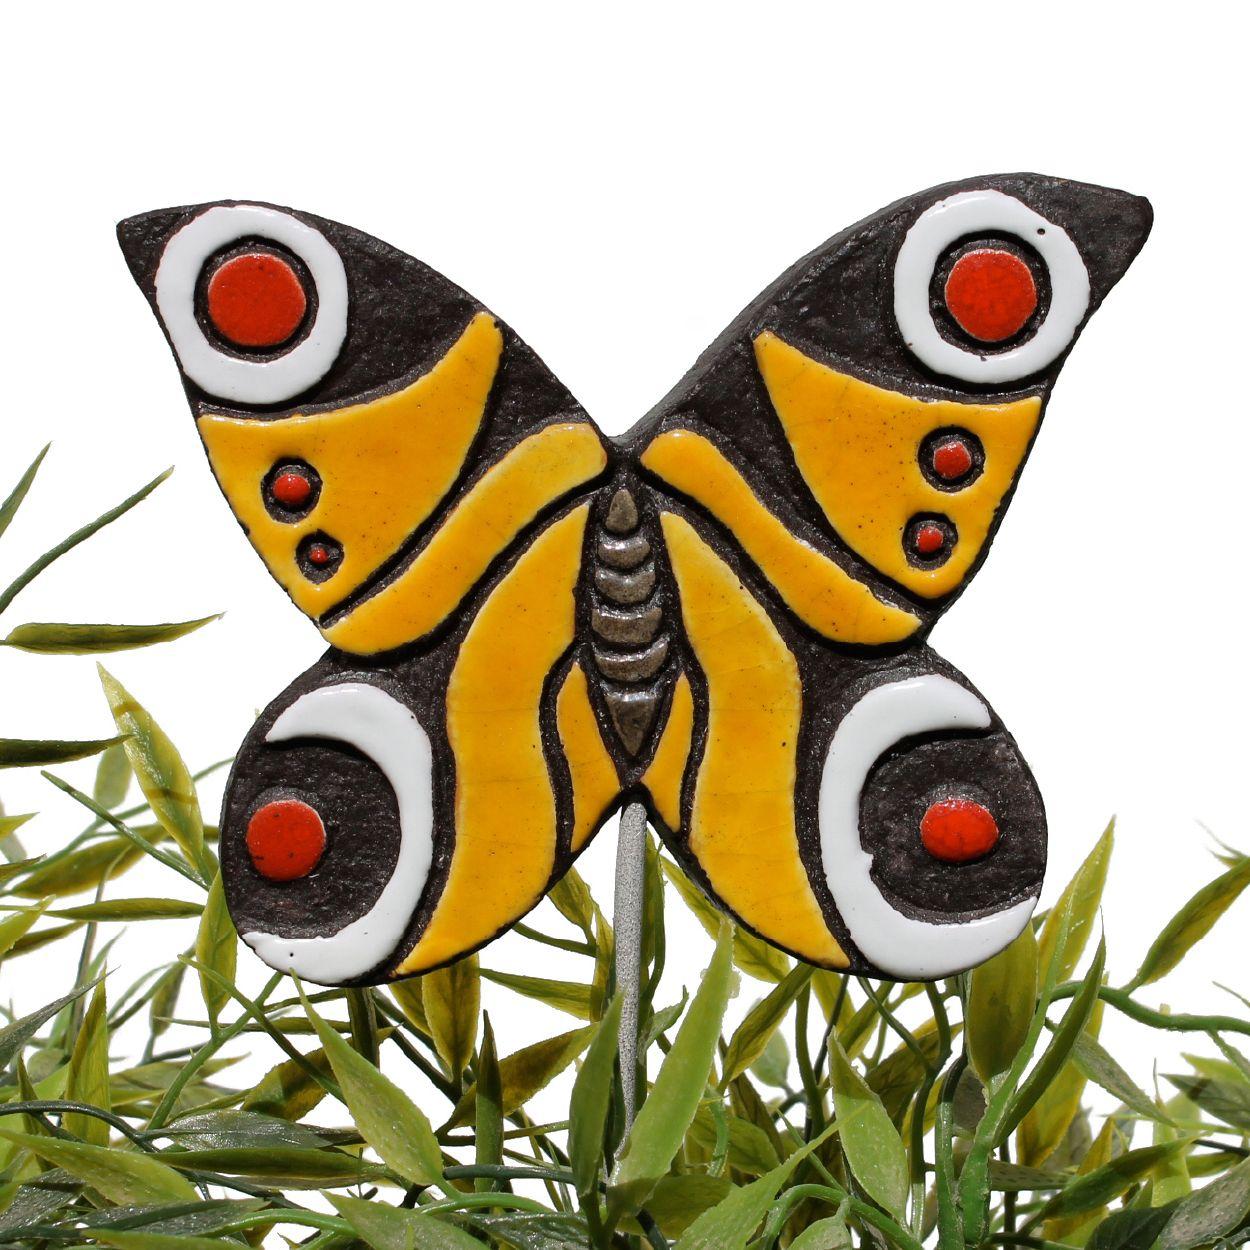 Ceramic butterfly garden art. Peacock butterfly garden decor. Yellow and red. www.gvega.com.